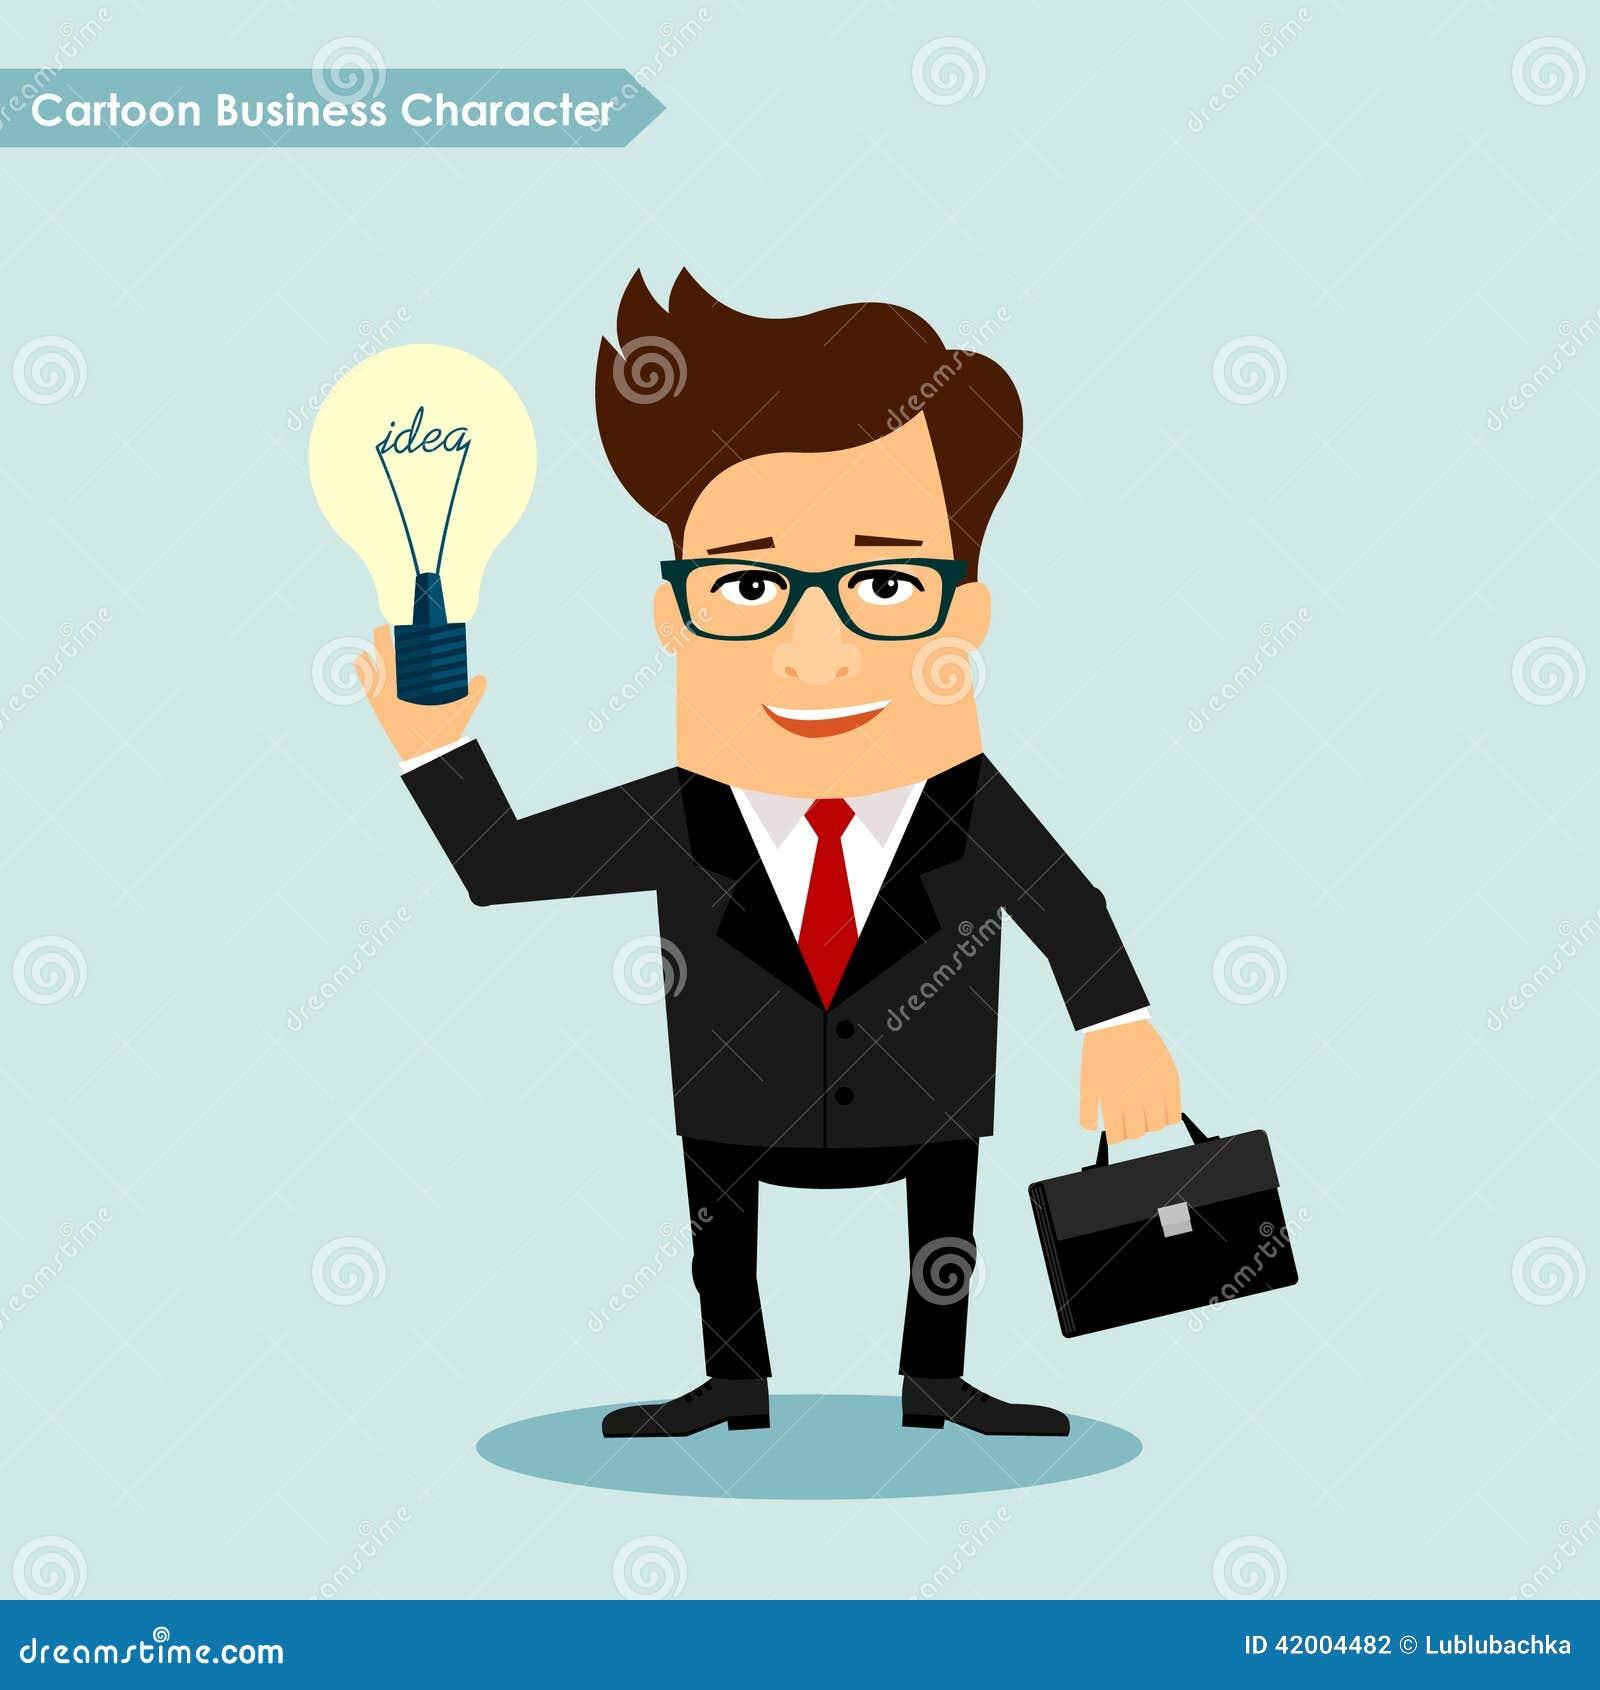 Cartoon Characters Vector : Business man cartoon vector character ankaperla